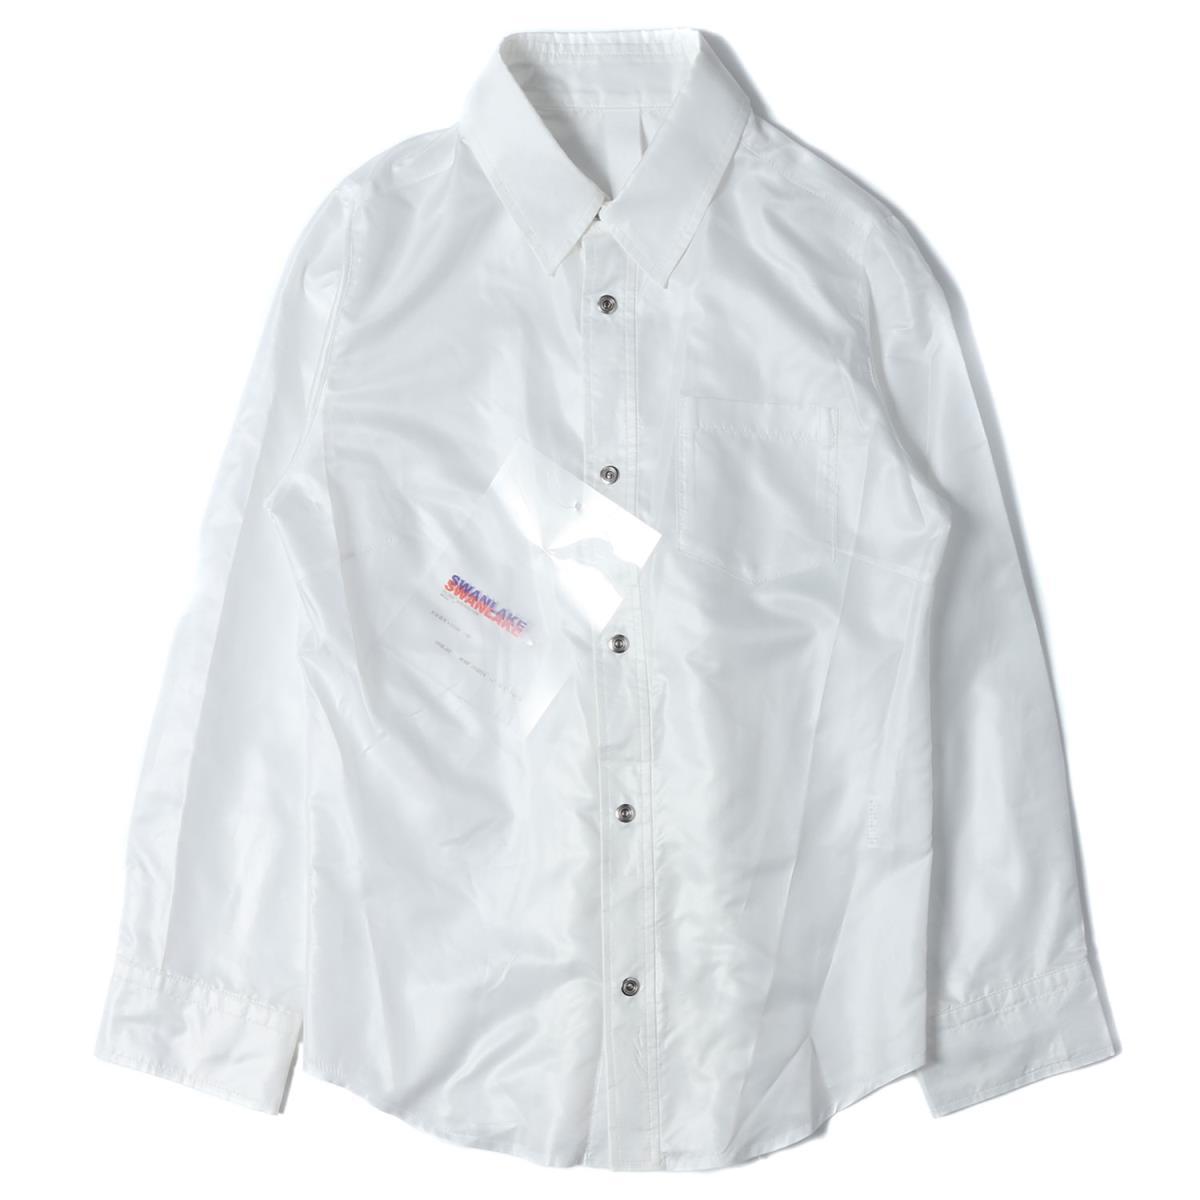 SWANLAKE スワンレイク サテン フリルシャツ ブラウス 19春夏 ホワイト 【レディース】【K2637】